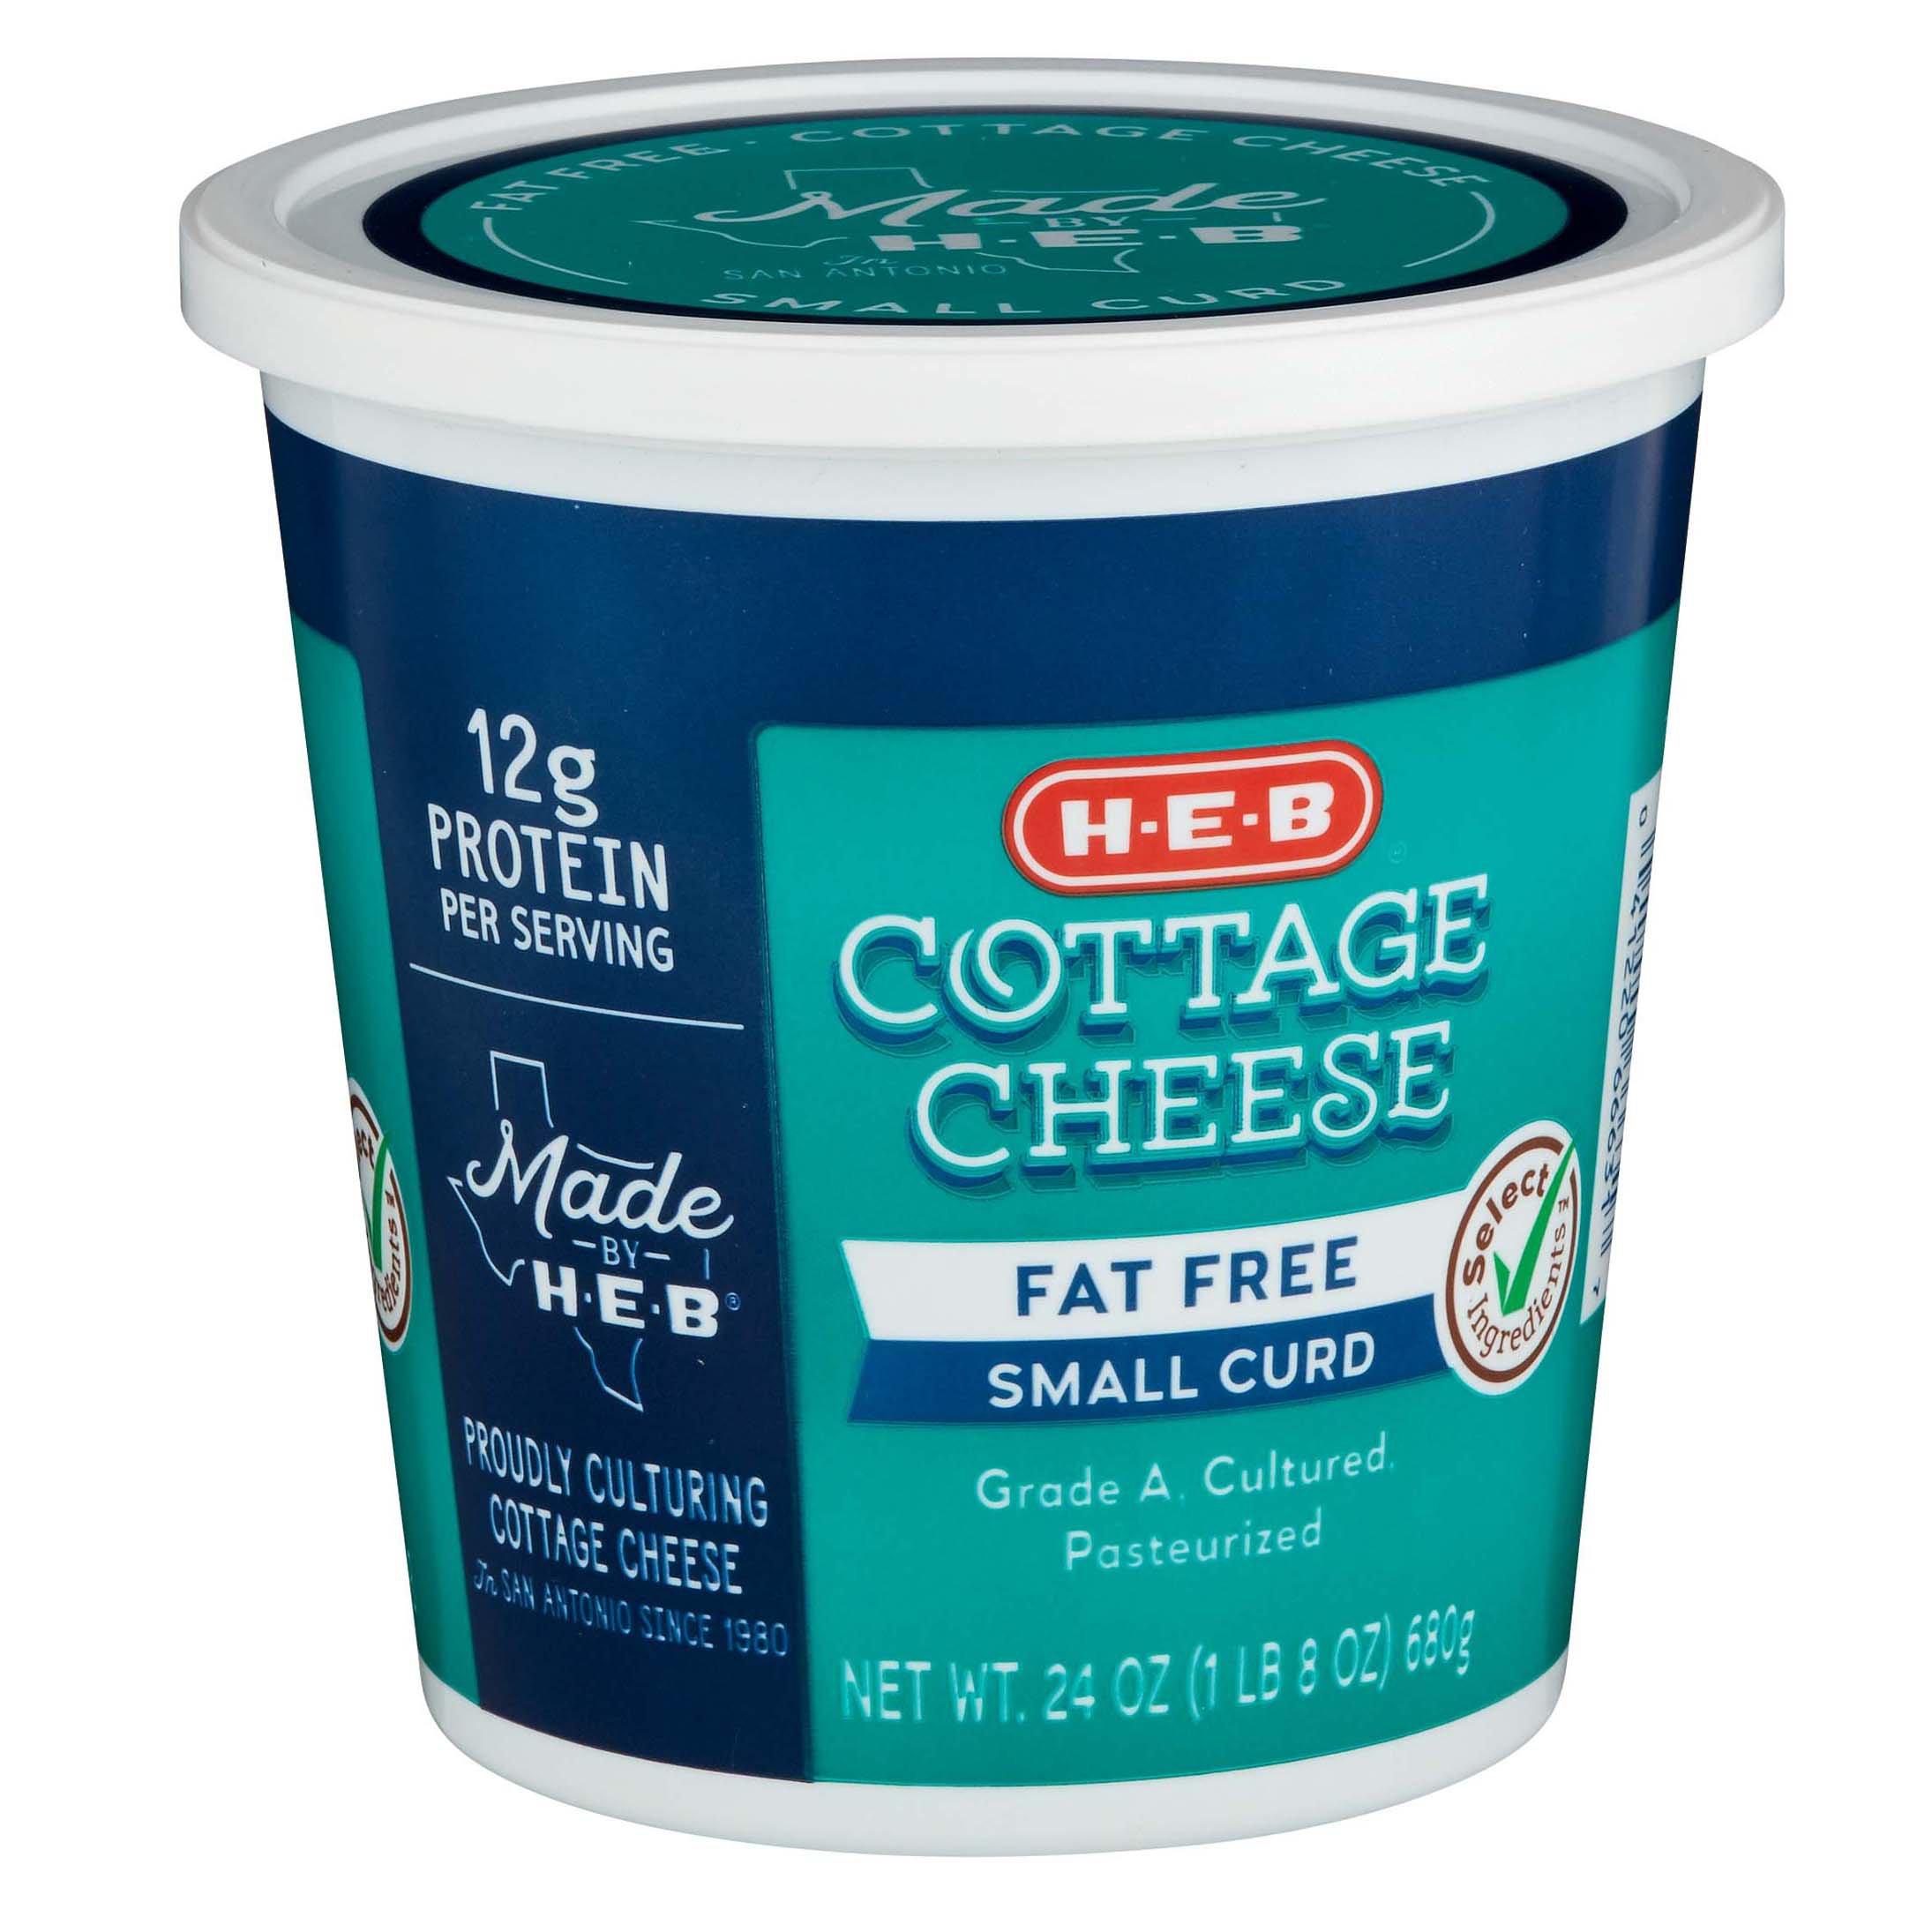 h u2011e u2011b fat free cottage cheese u2011 shop cottage cheese at heb rh heb com fat content in cottage cheese fat percentage in cottage cheese